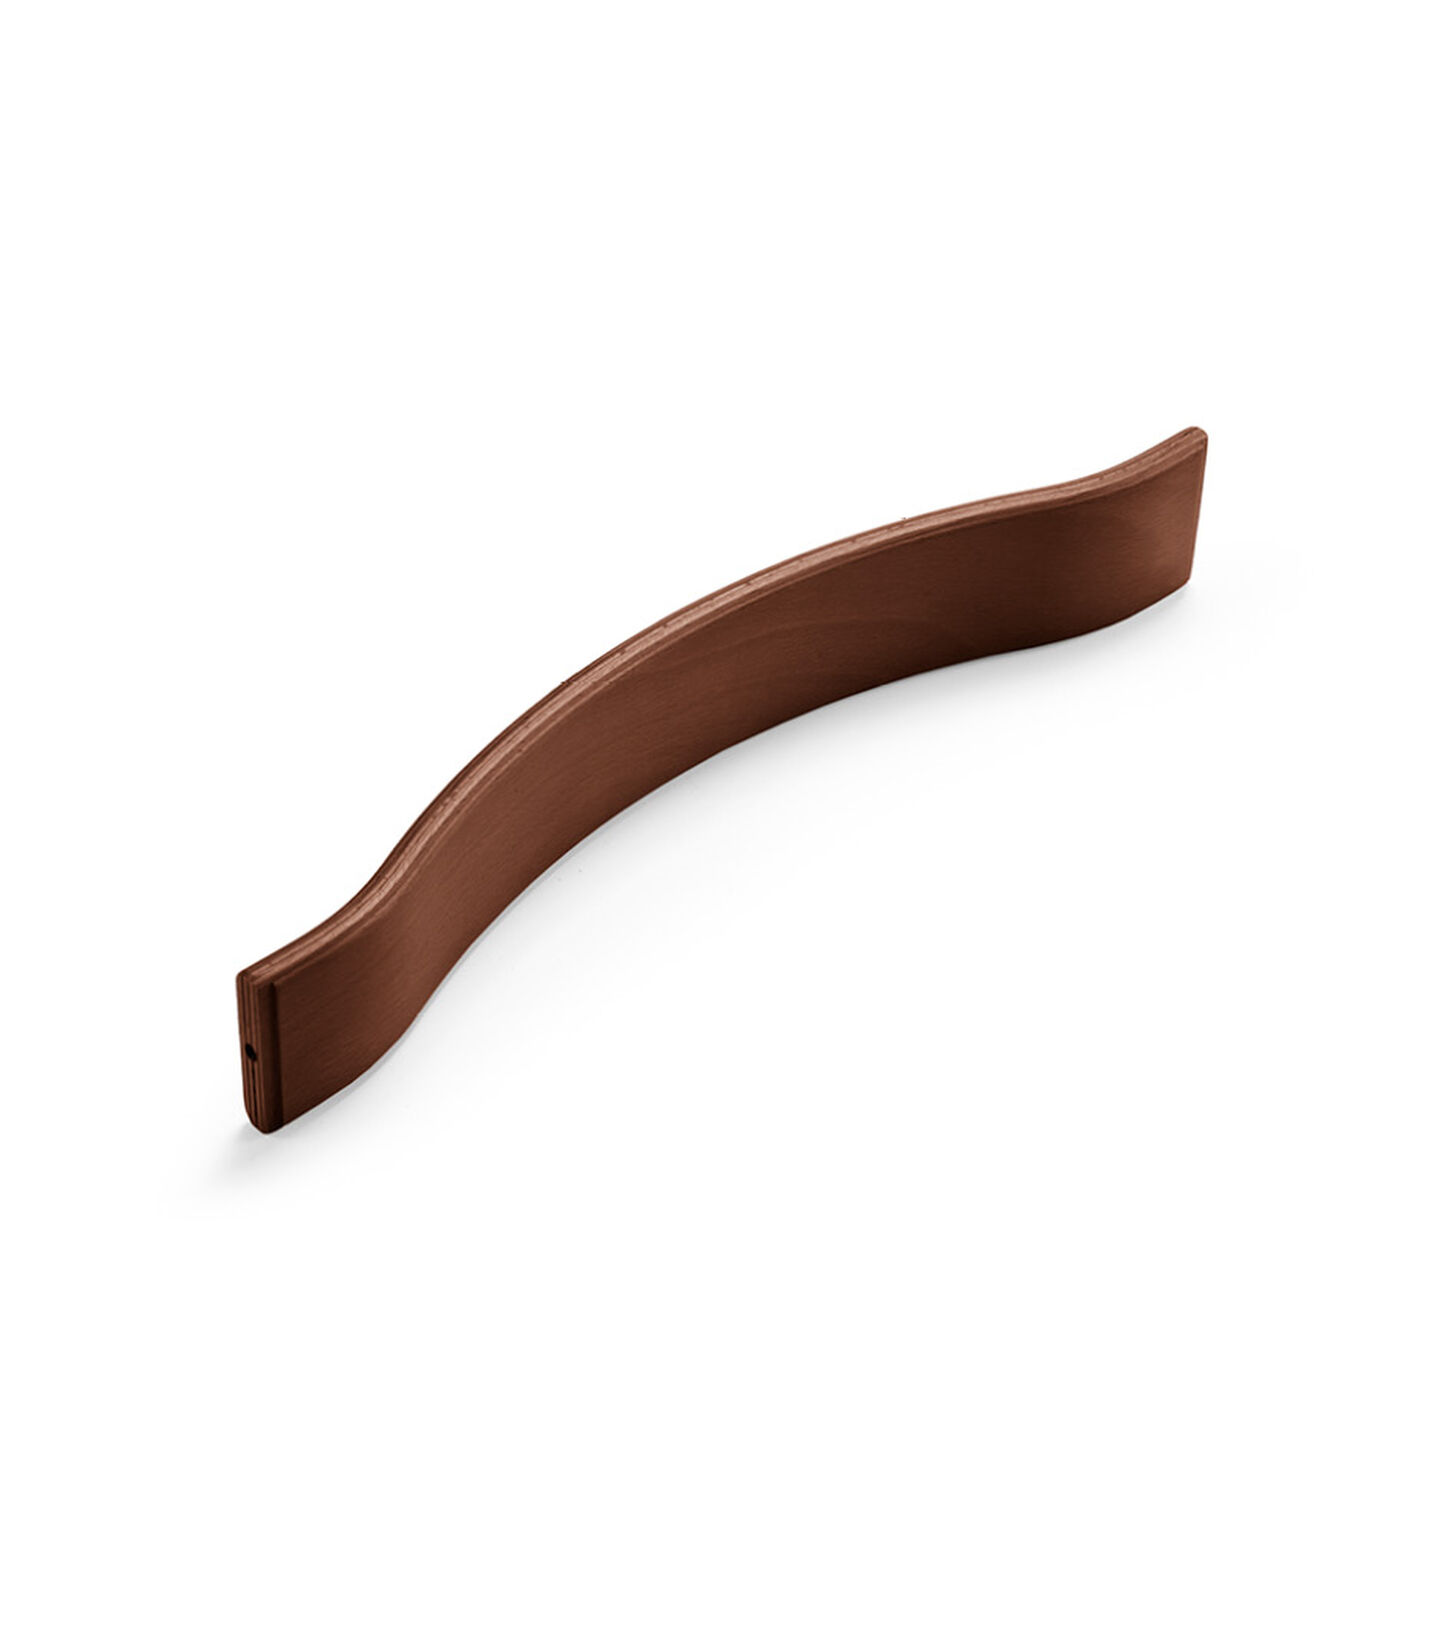 Tripp Trapp® Rugleuning Walnut Brown, Walnut, mainview view 1